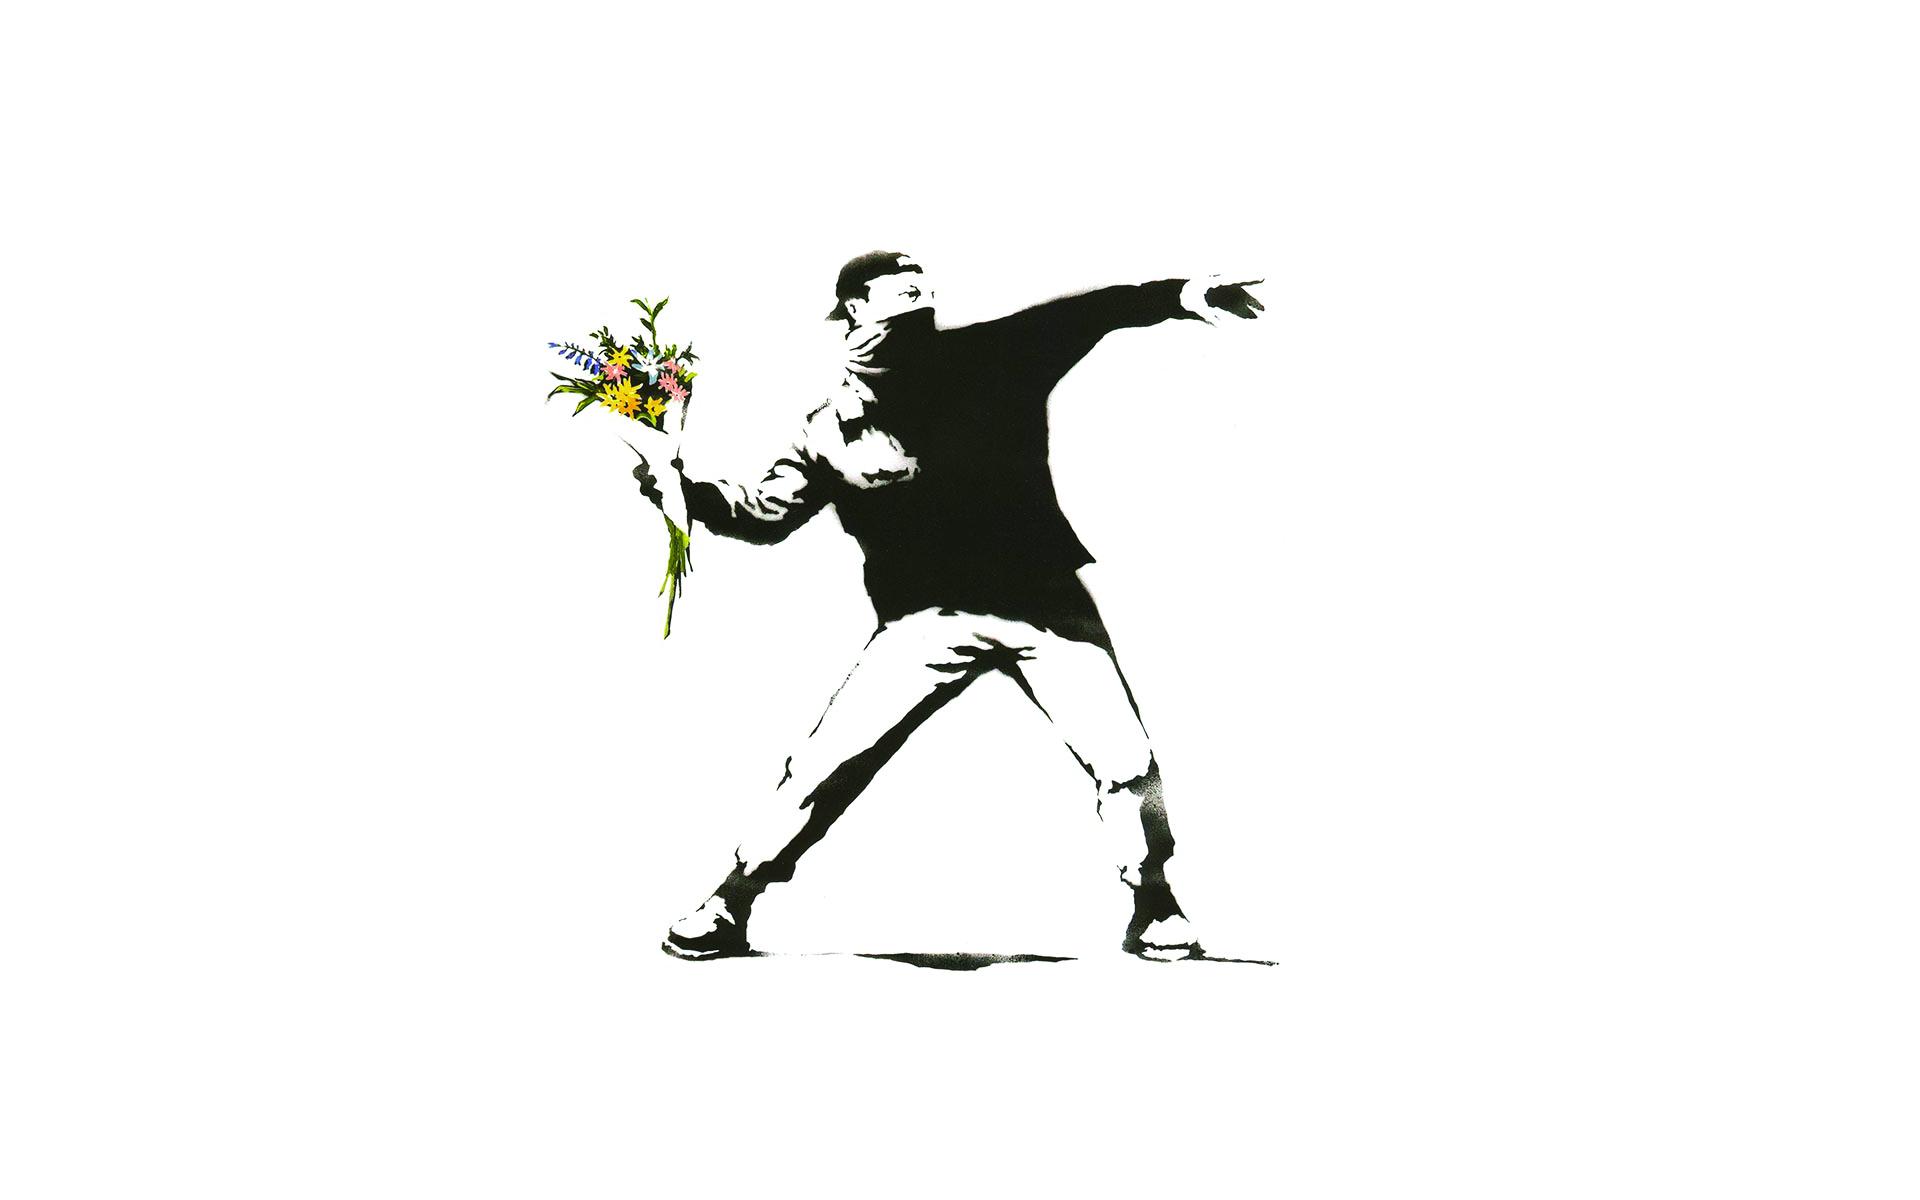 Flower Thrower Banksy